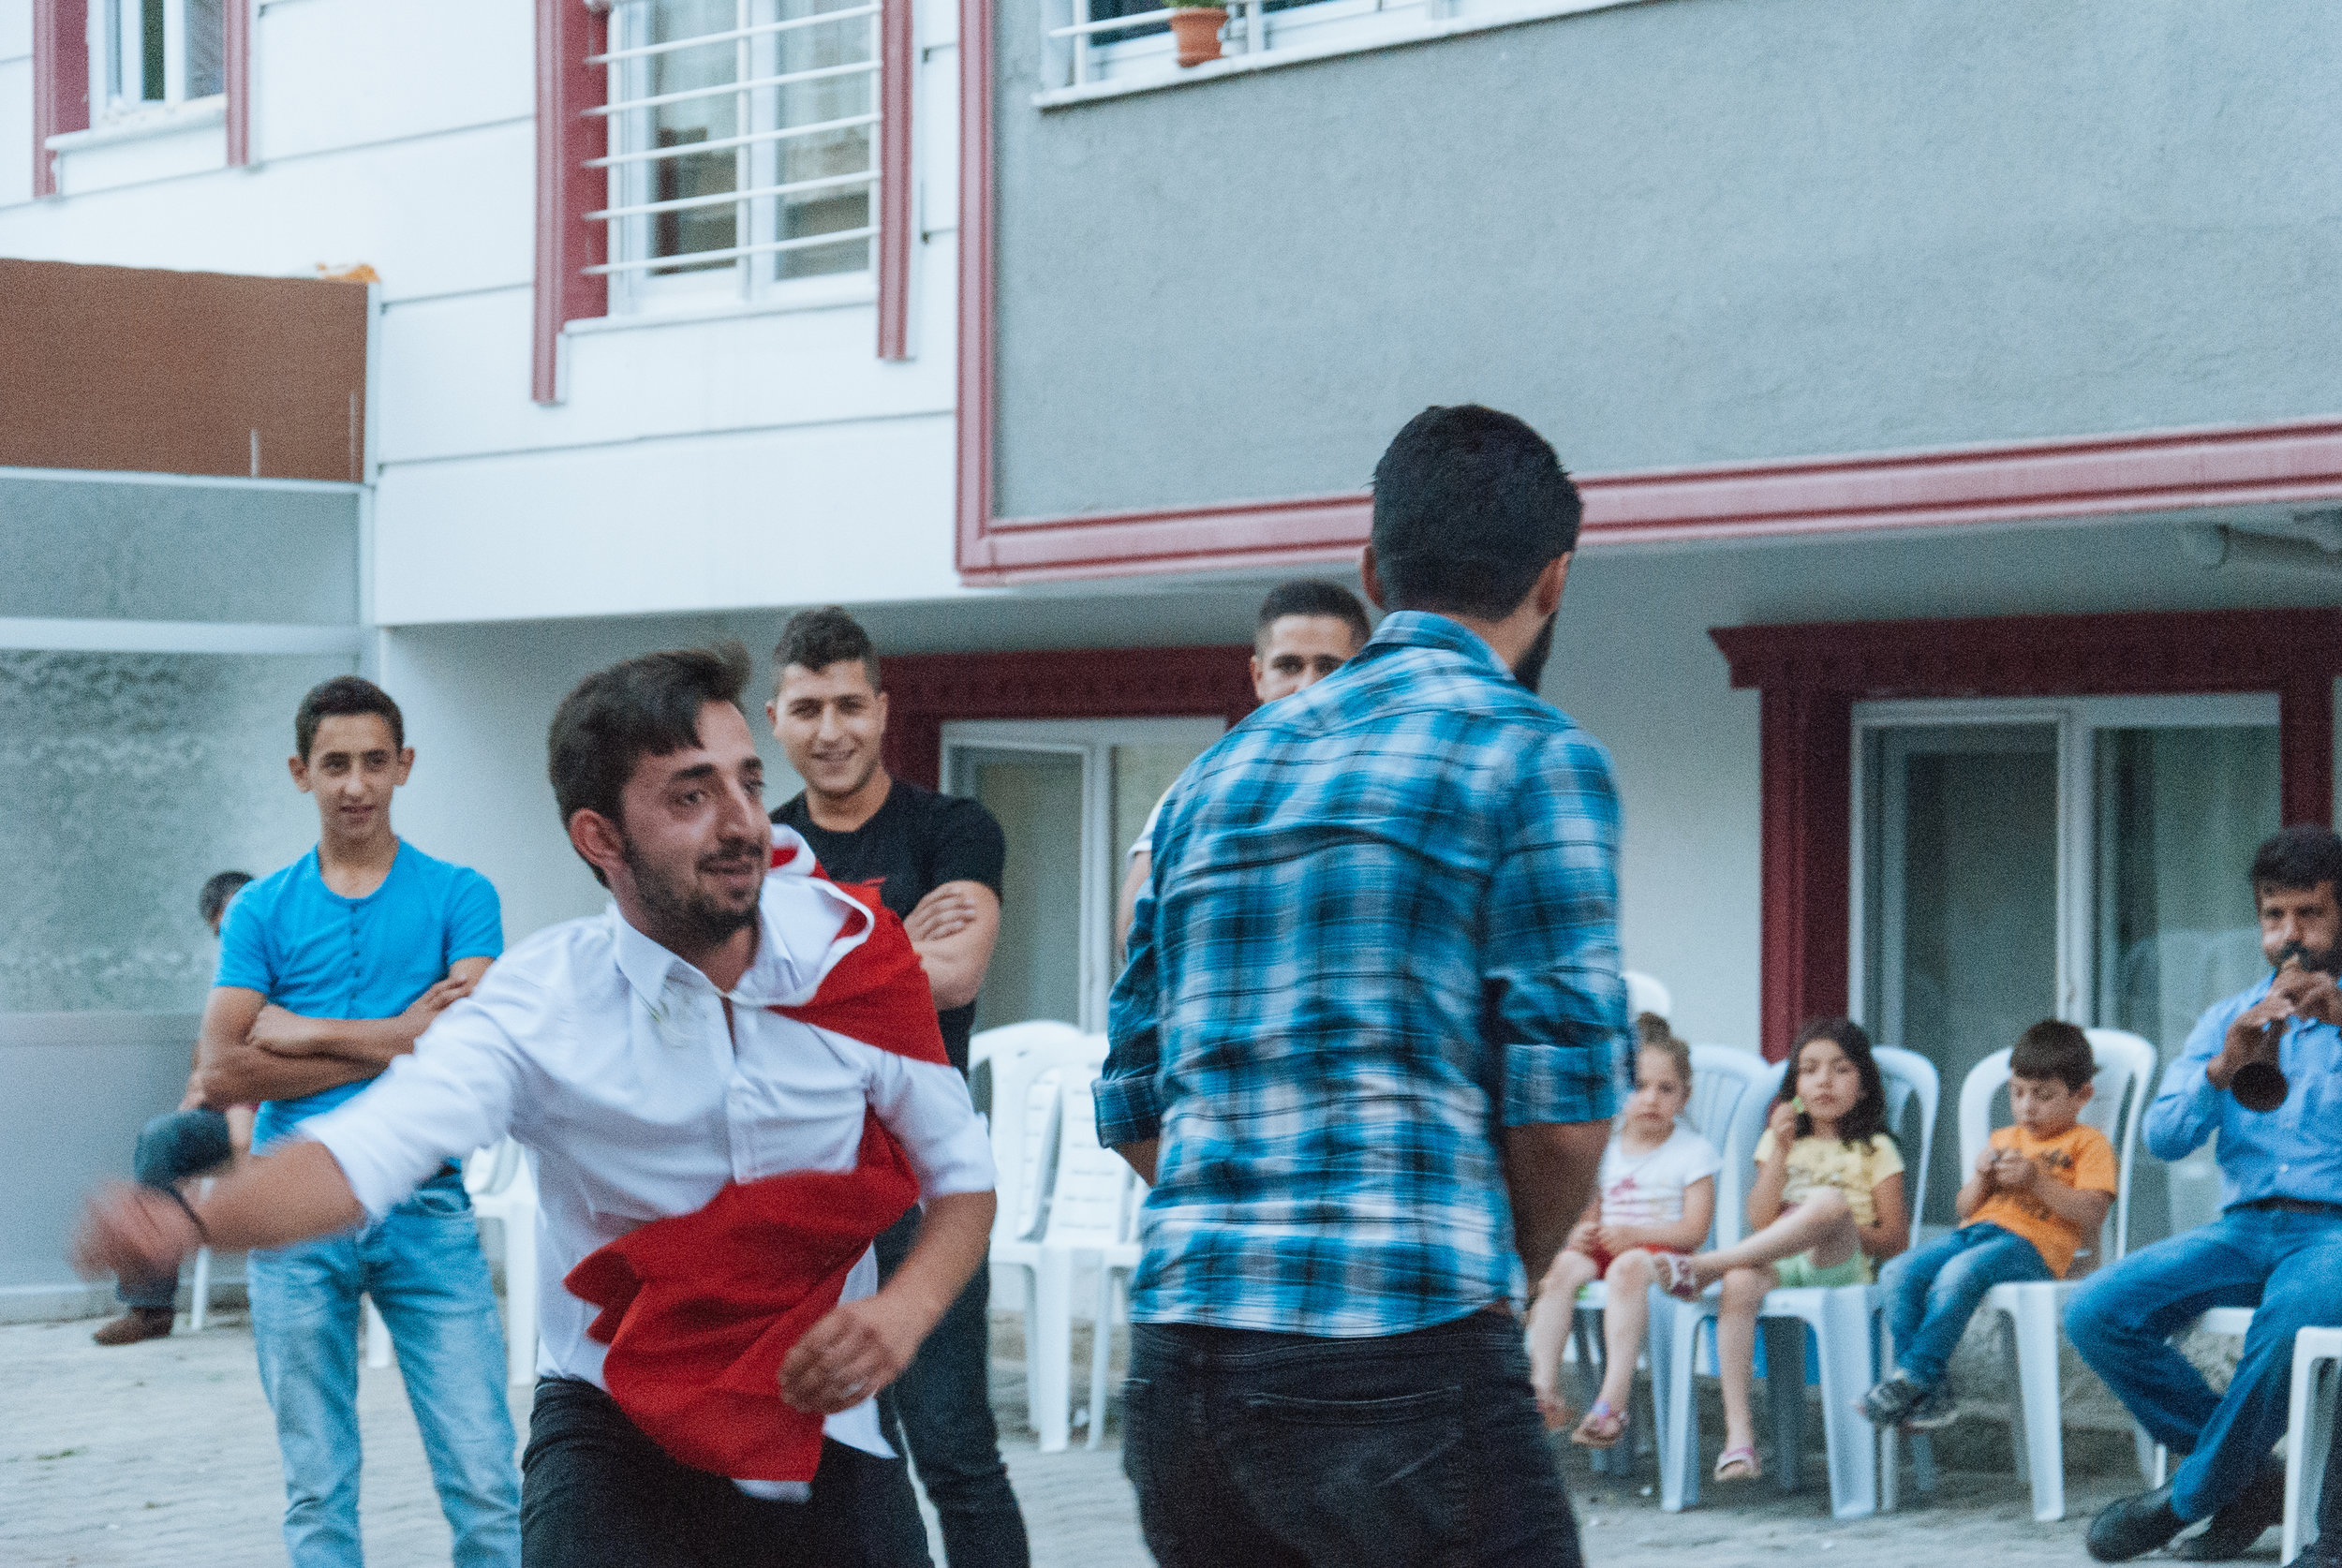 The punching dance